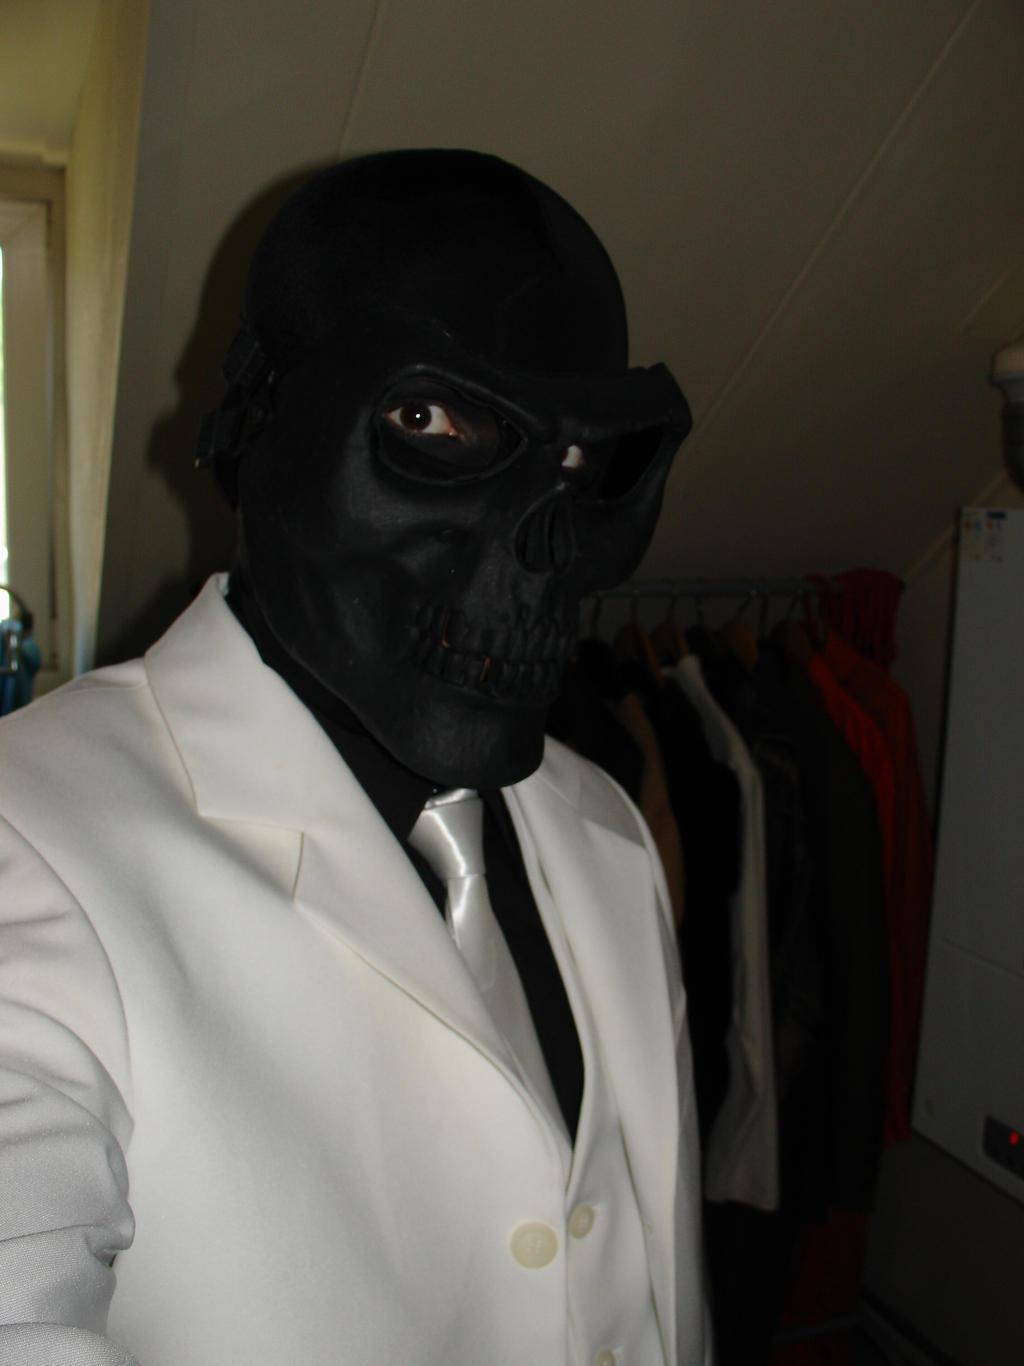 Black Mask Arkham Origins WIP 1 by Zaurask on DeviantArt